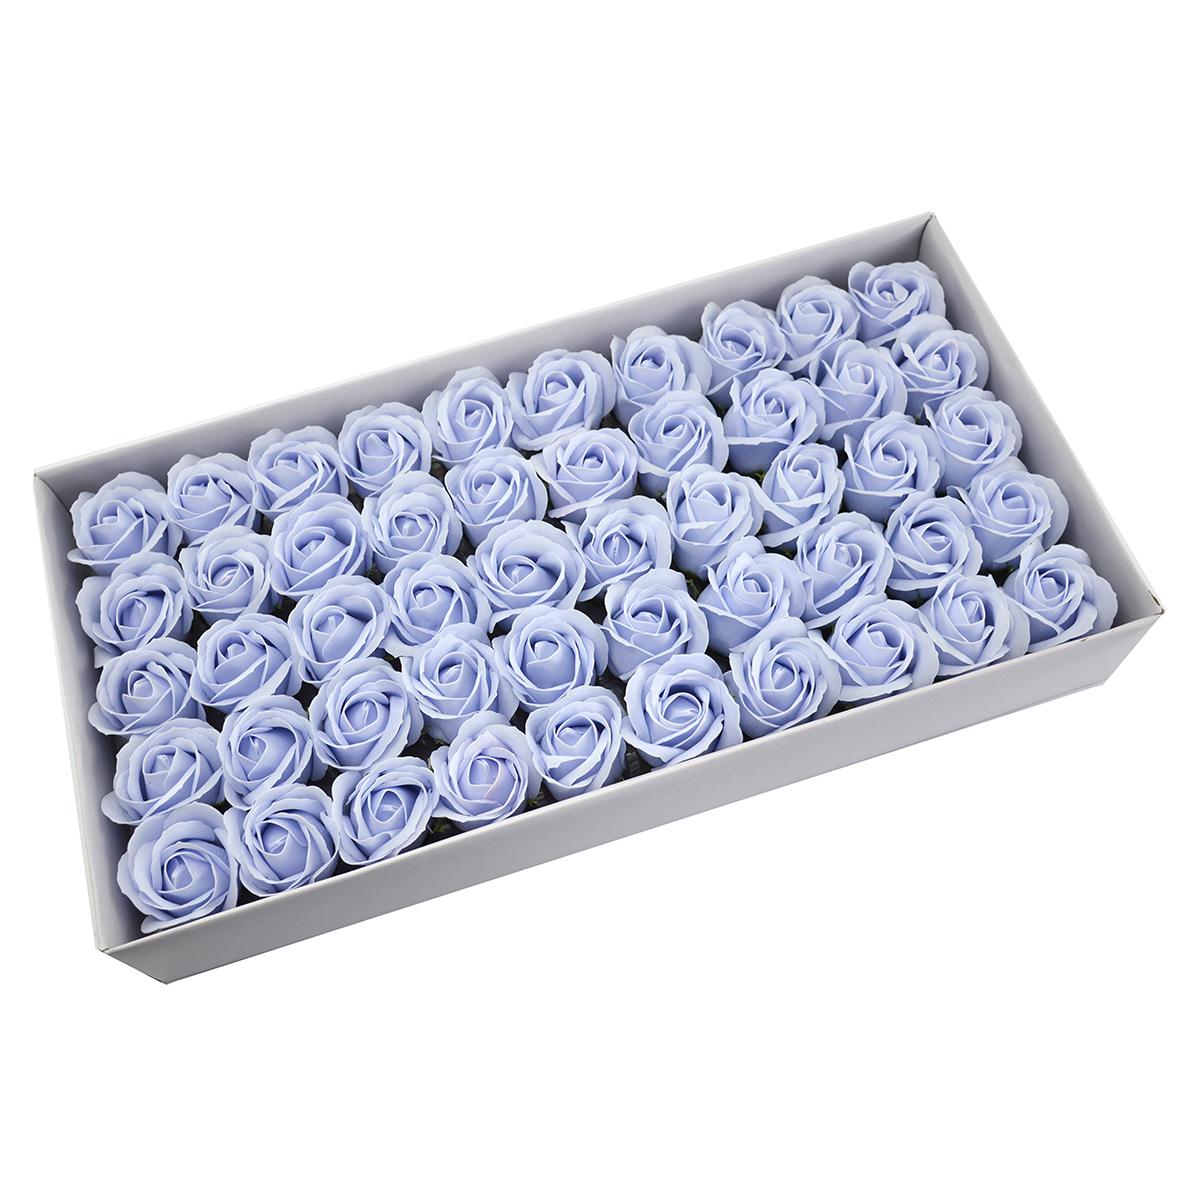 Juego de 50 rosas de jabón aromáticas, toque real, azul claro